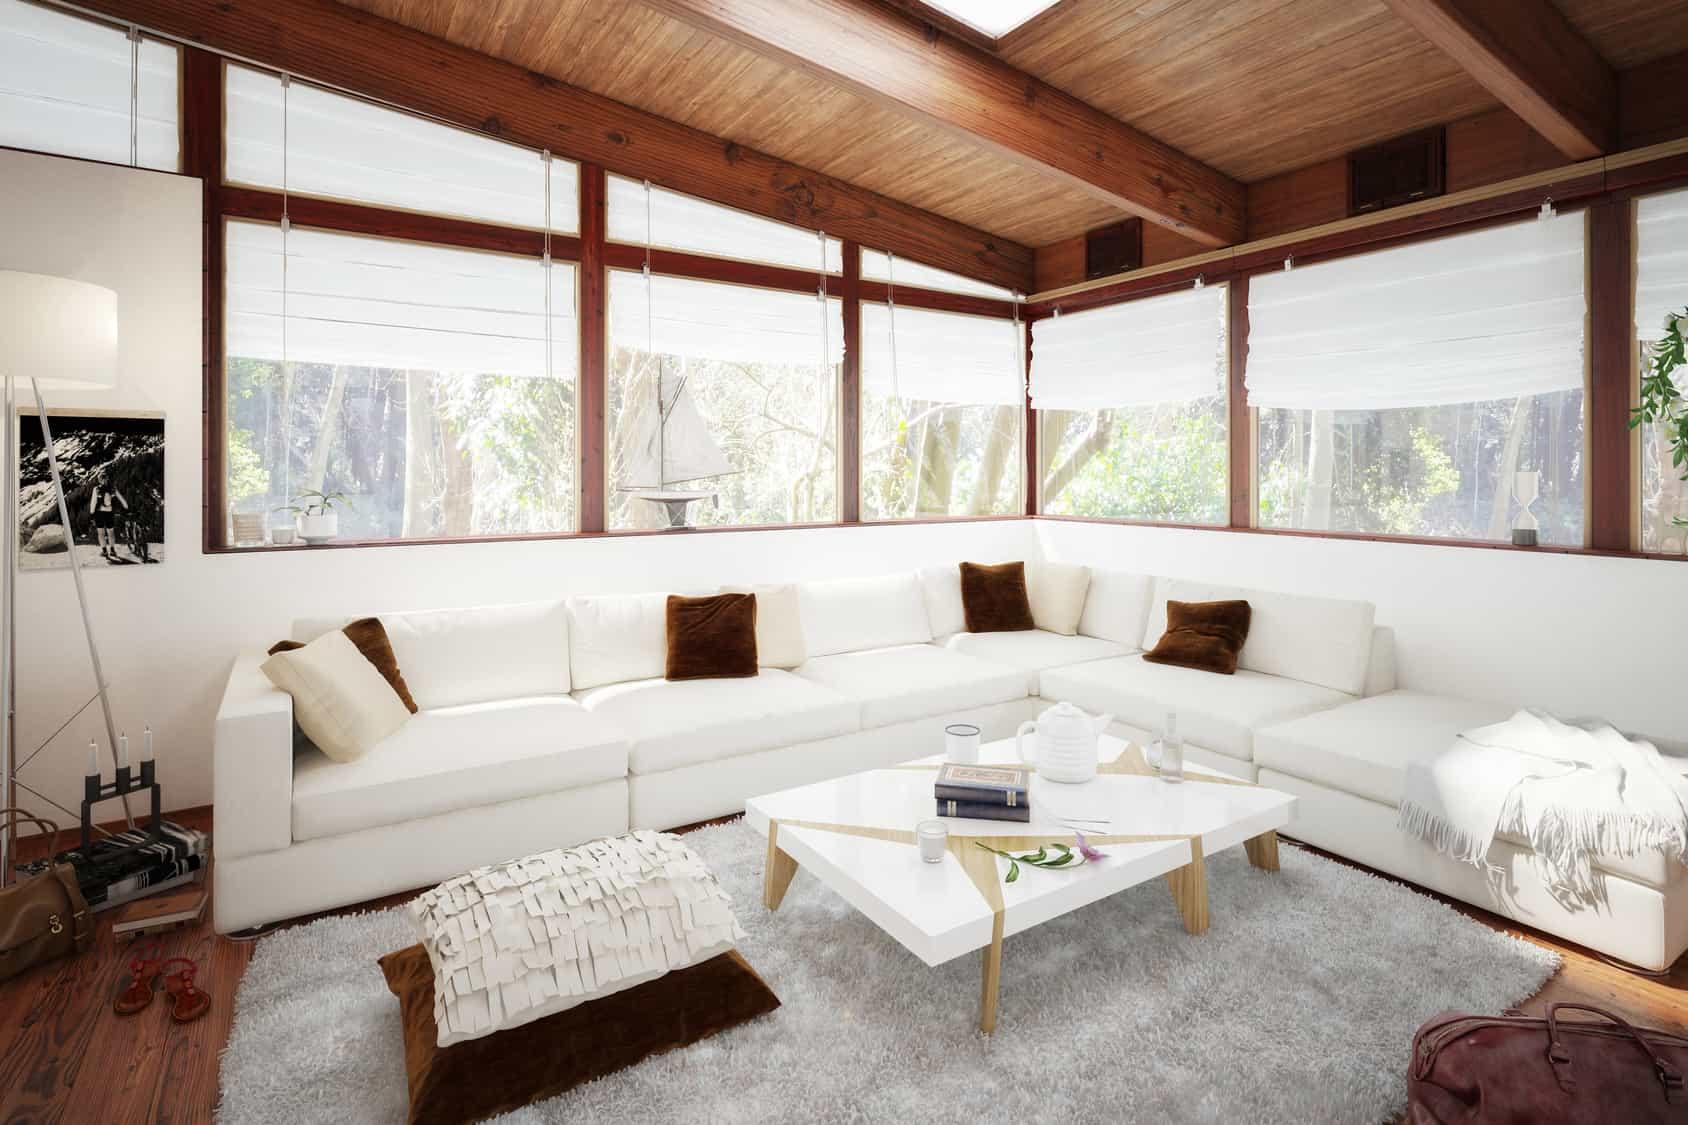 véranda rétro avec toit en bois